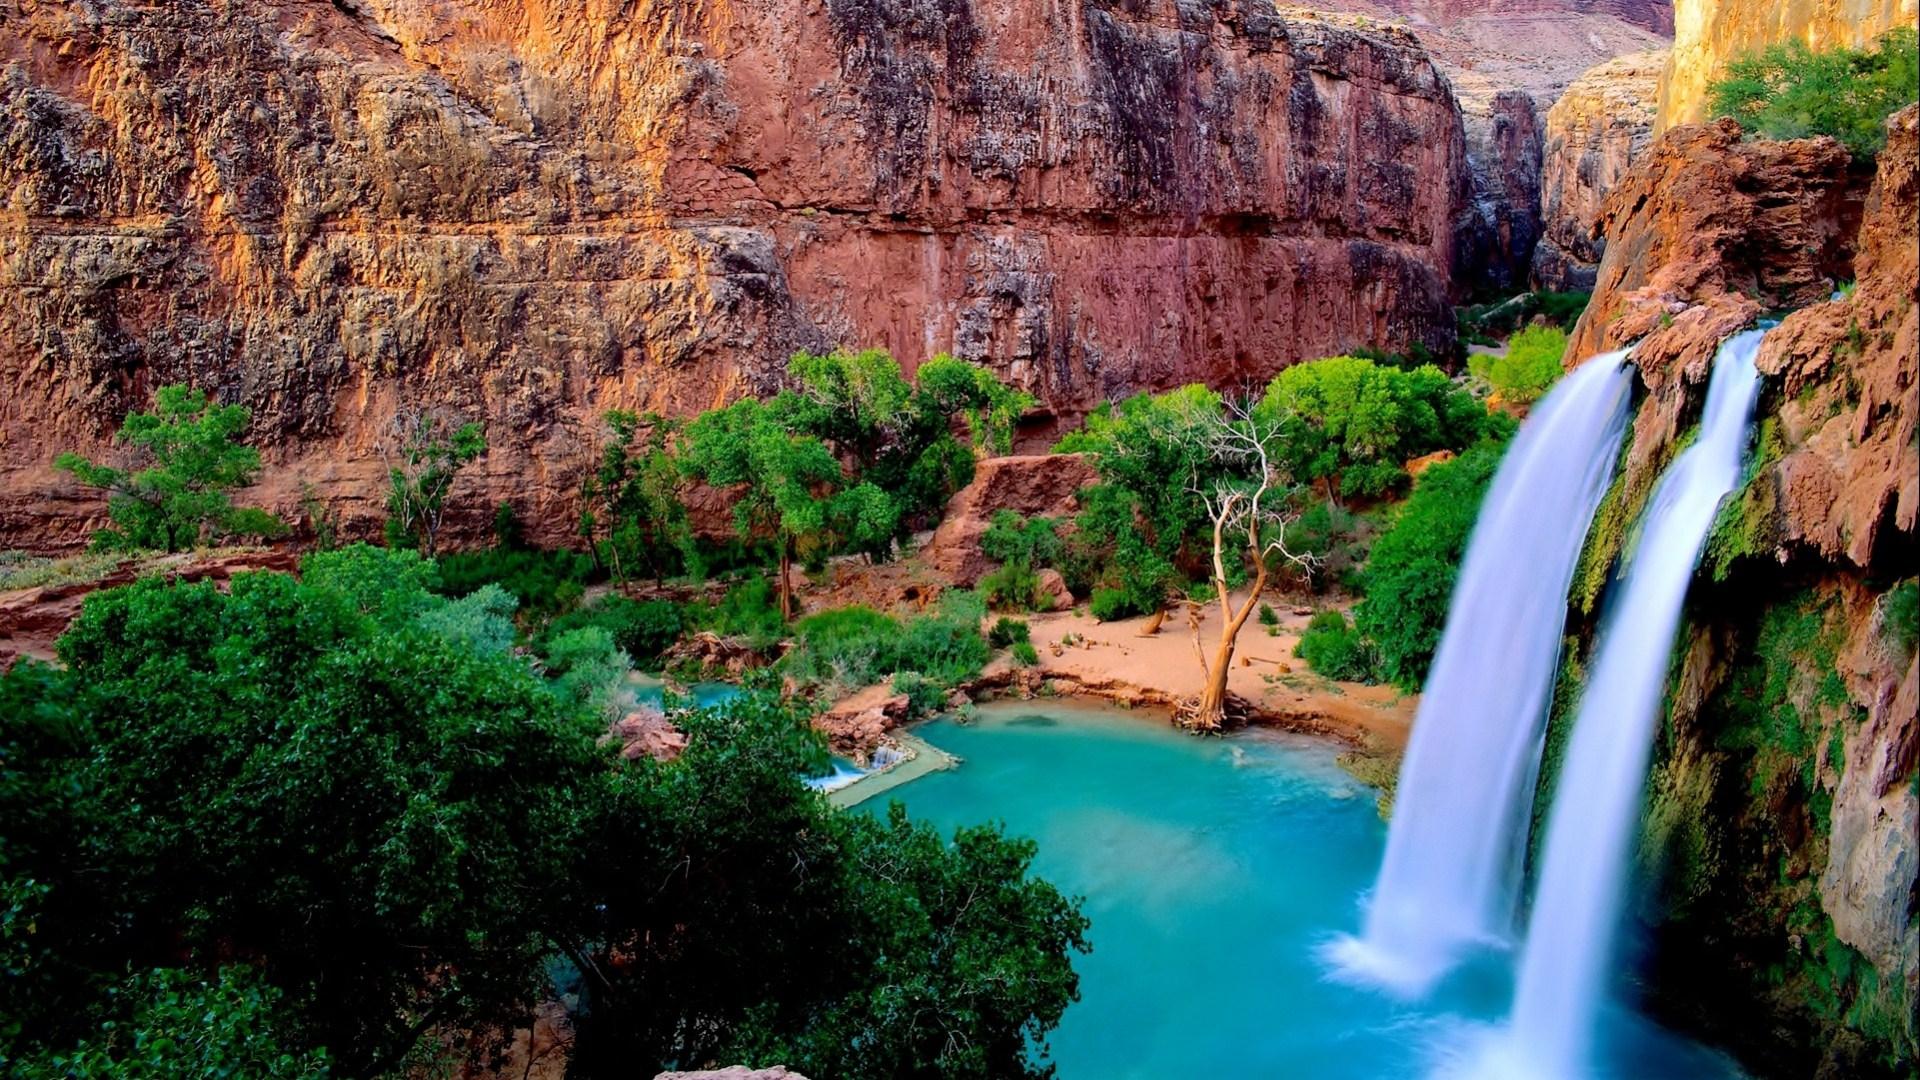 Waterfall Wallpaper   Most Beautiful Waterfall Wallpapers for Desktop 1920x1080